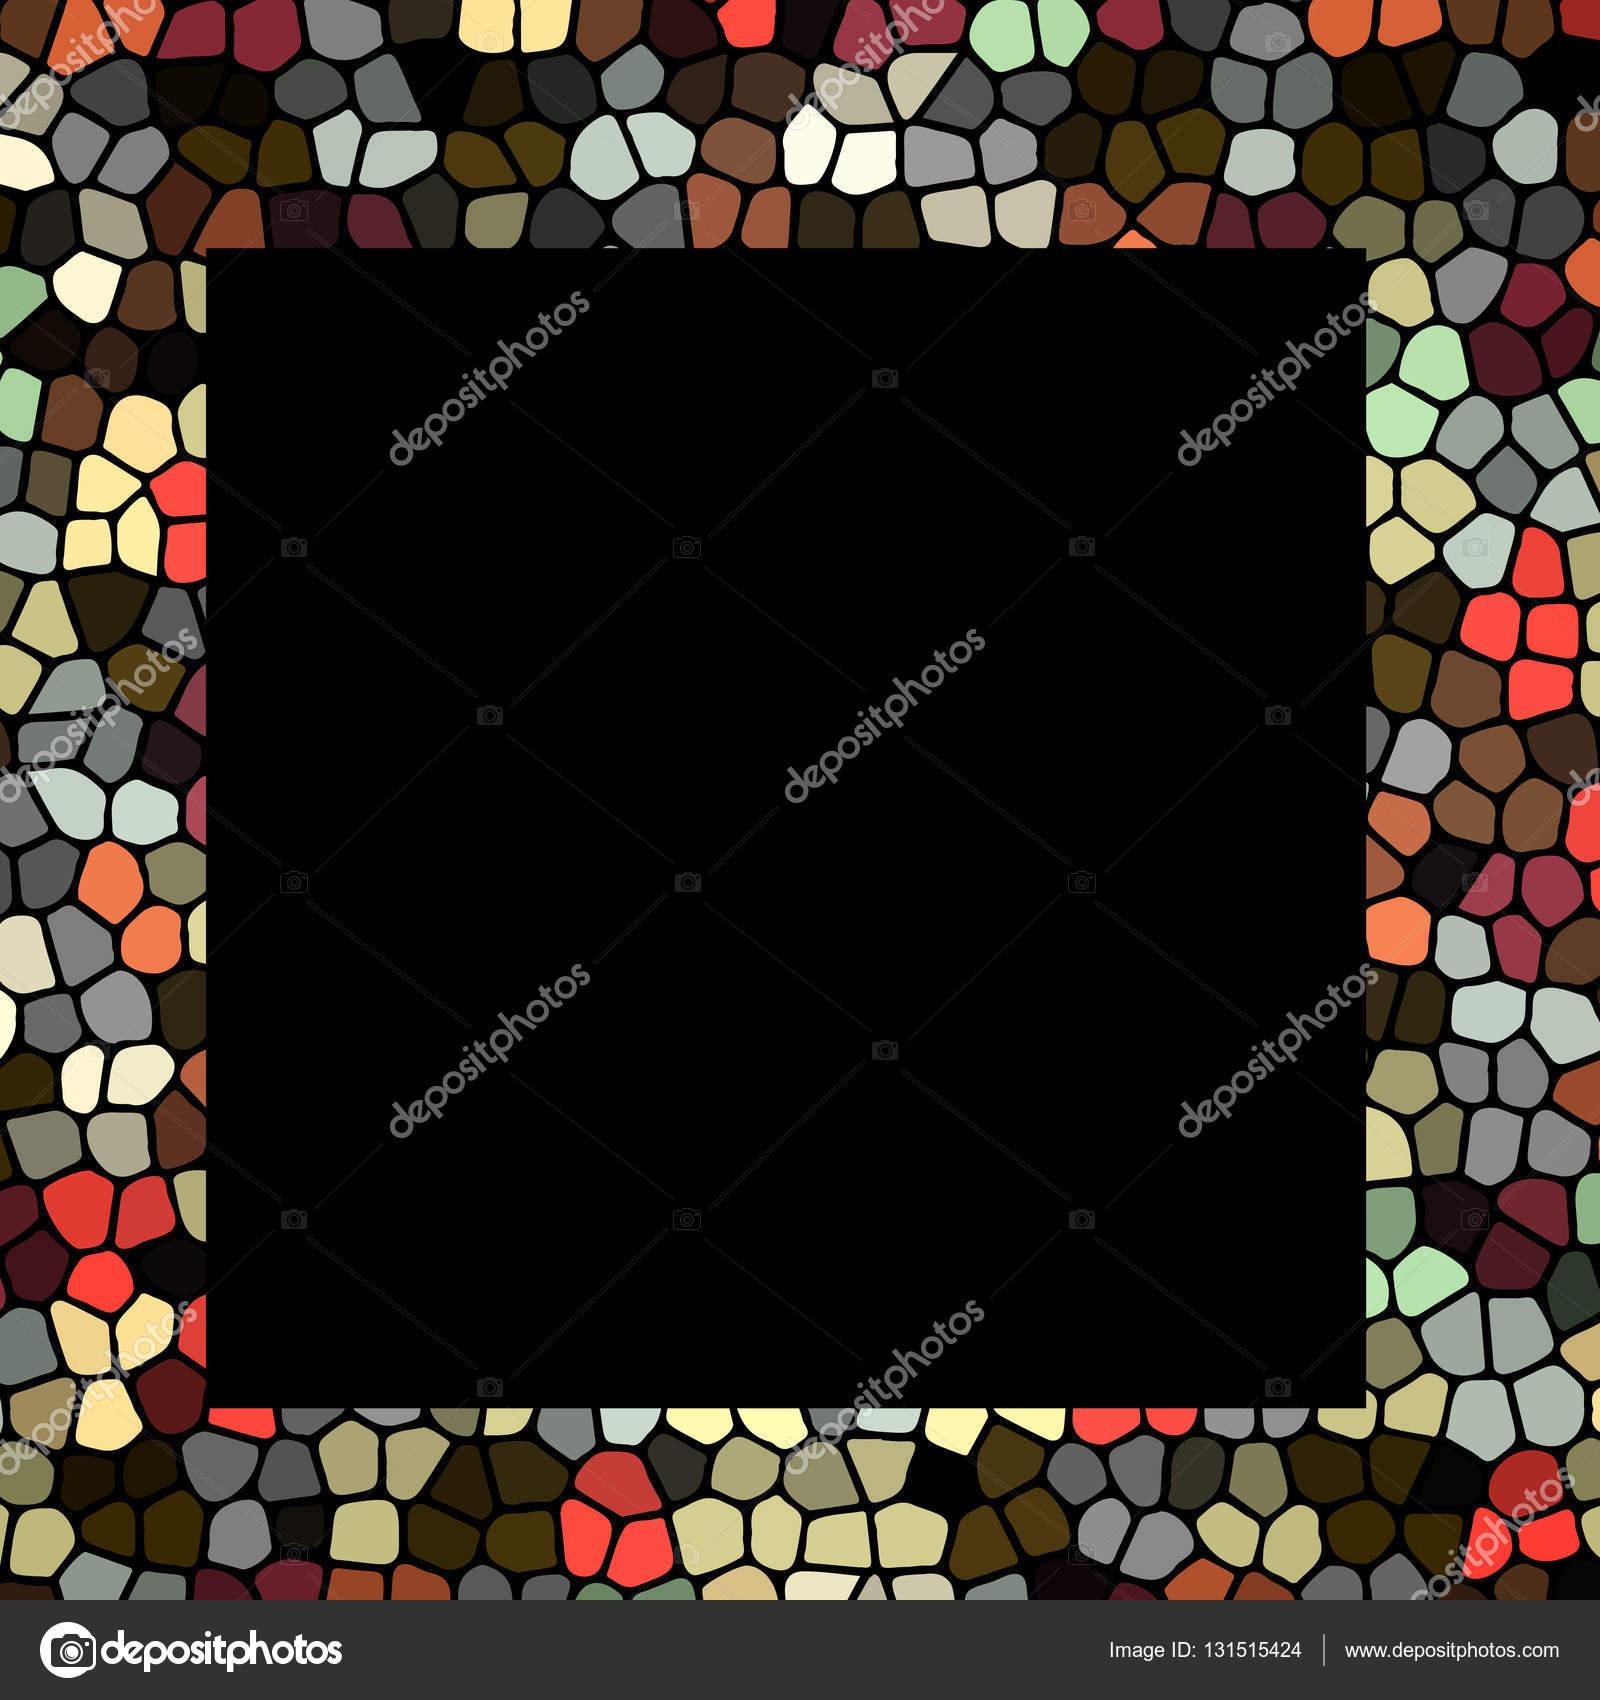 Retro-Mosaik-Rahmen — Stockvektor © A-R-T-U-R #131515424